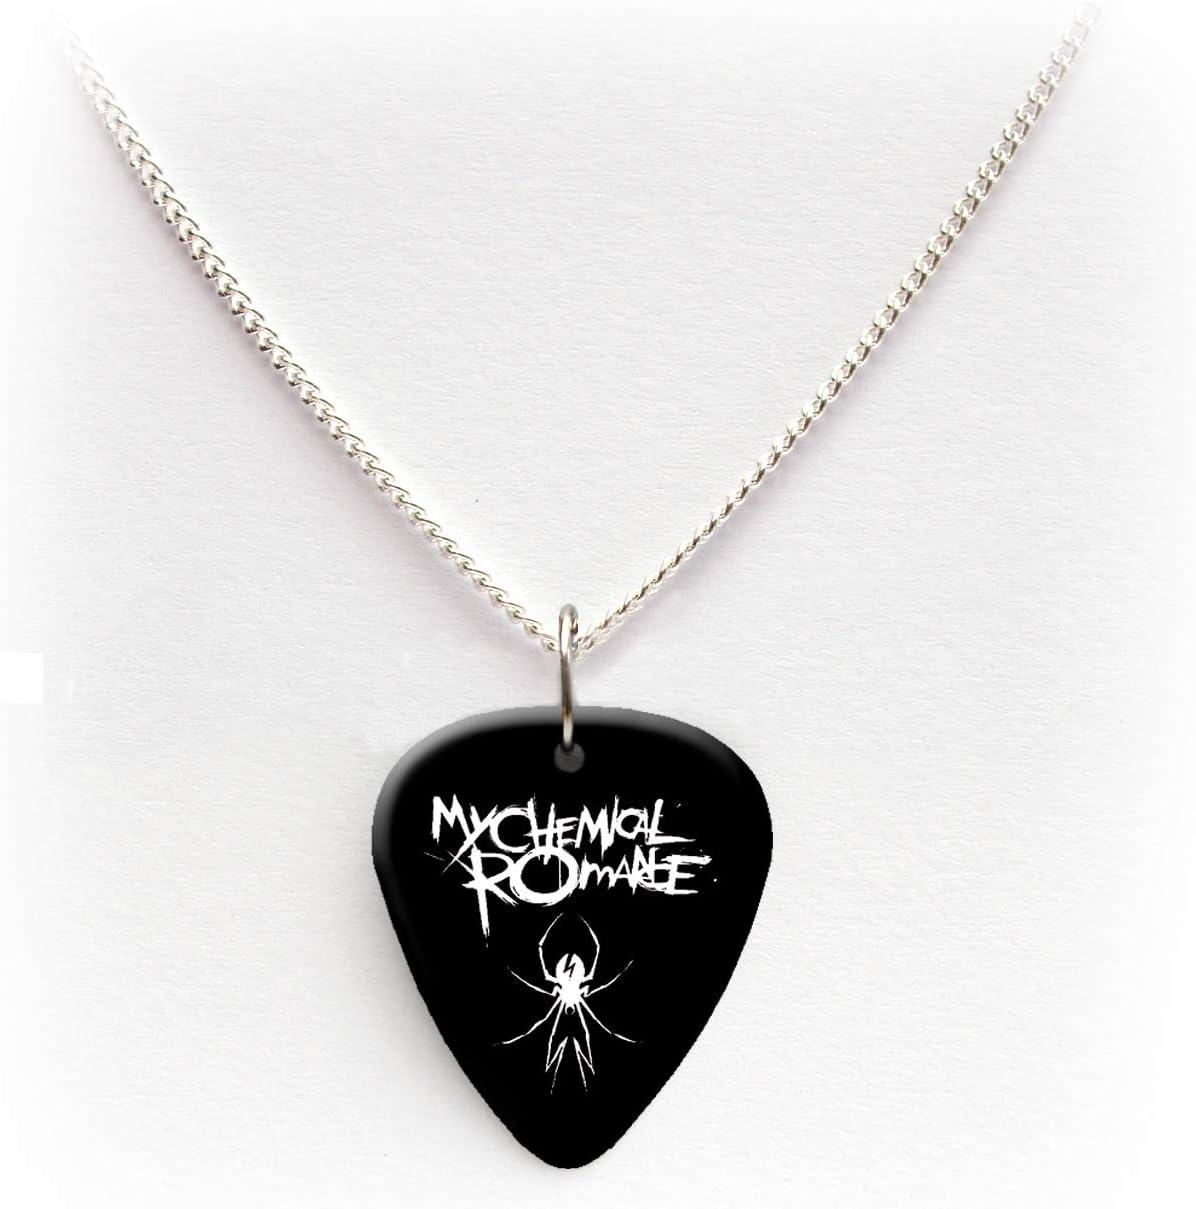 My Chemical Romance Guitar pick plectrum logo Necklace 24BW